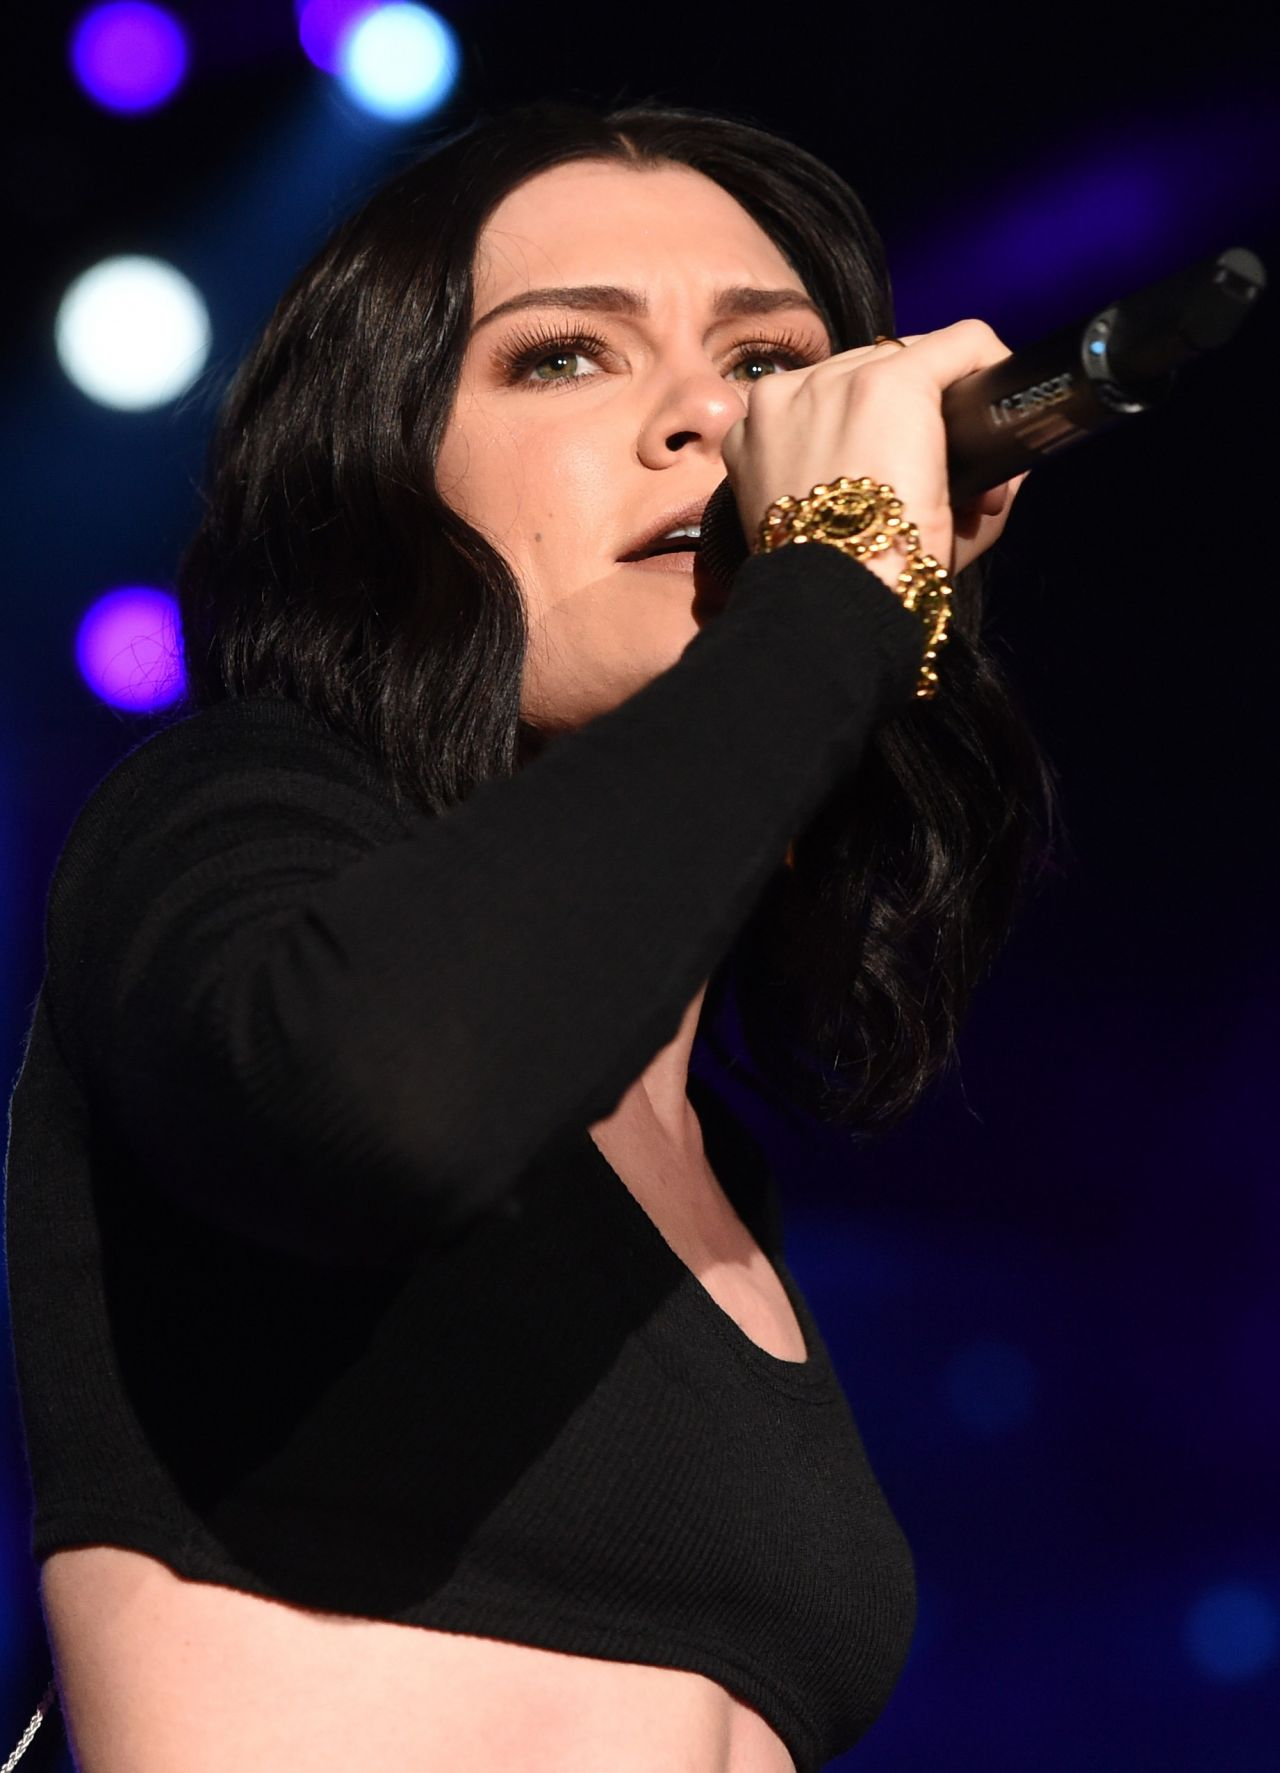 Jessie J - WE Day Show at Wembley Arena in London 3/22/ 2017 Jessie Show 2017